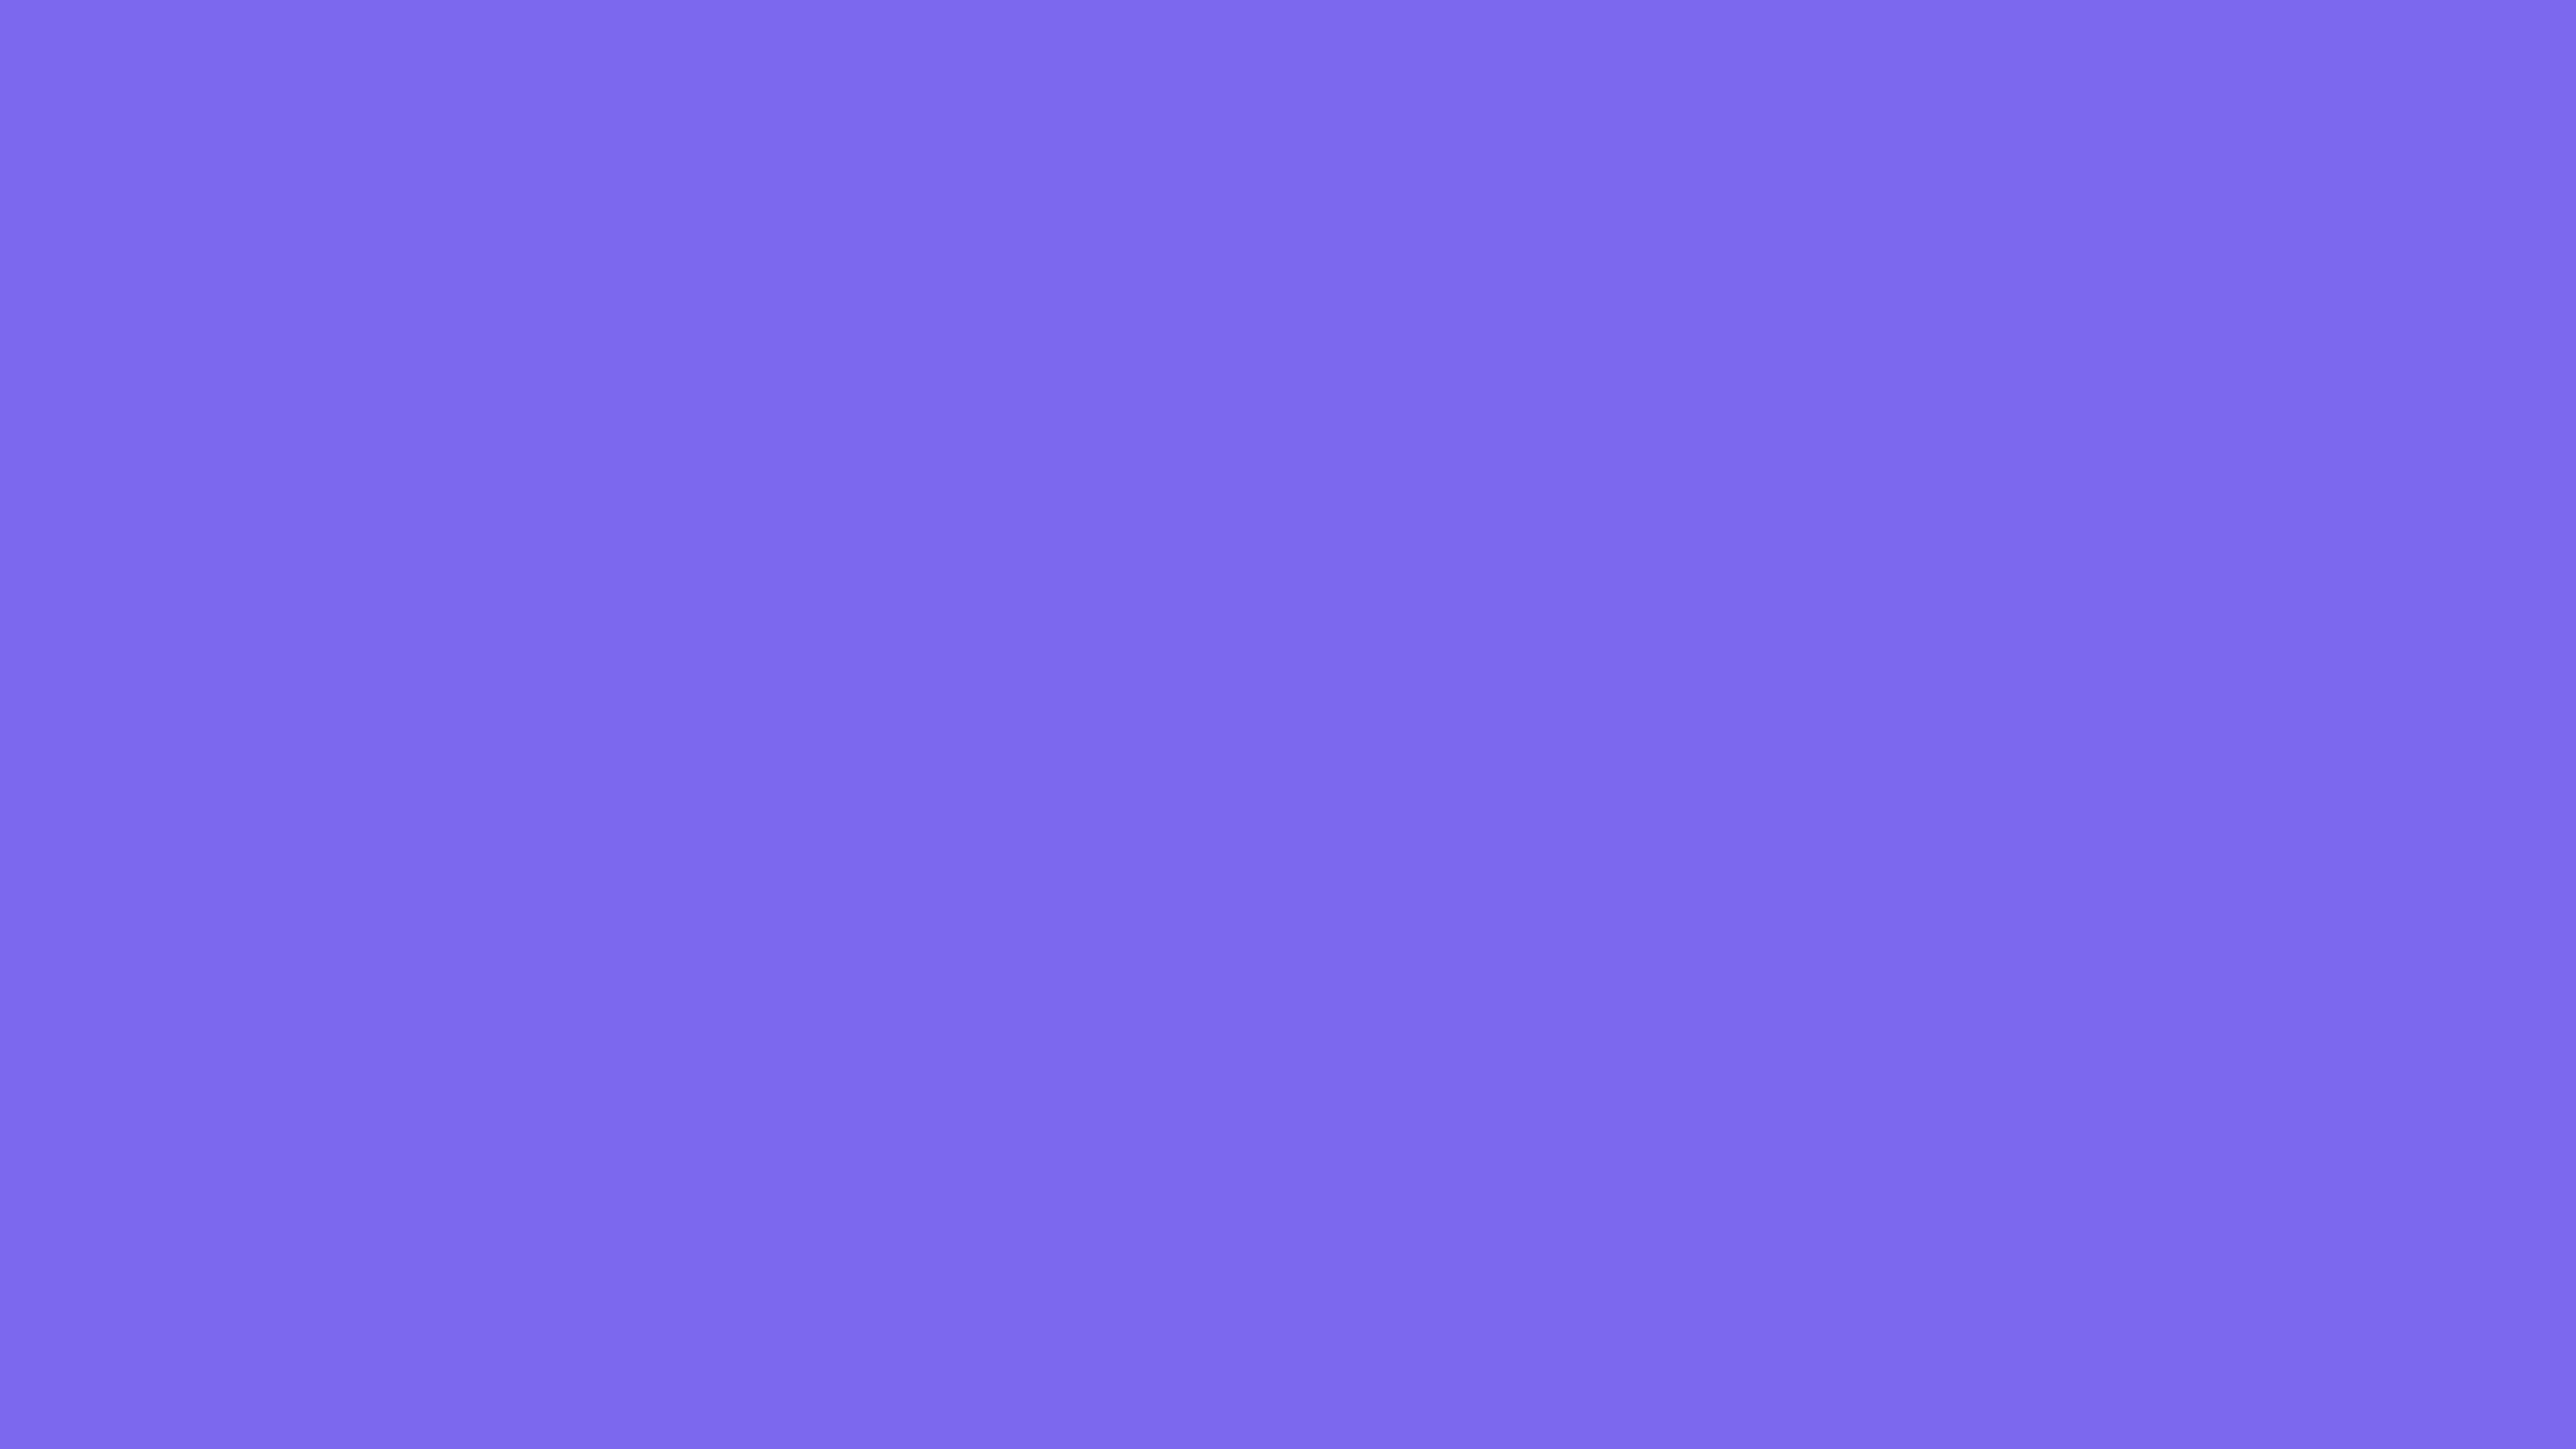 4096x2304 Medium Slate Blue Solid Color Background